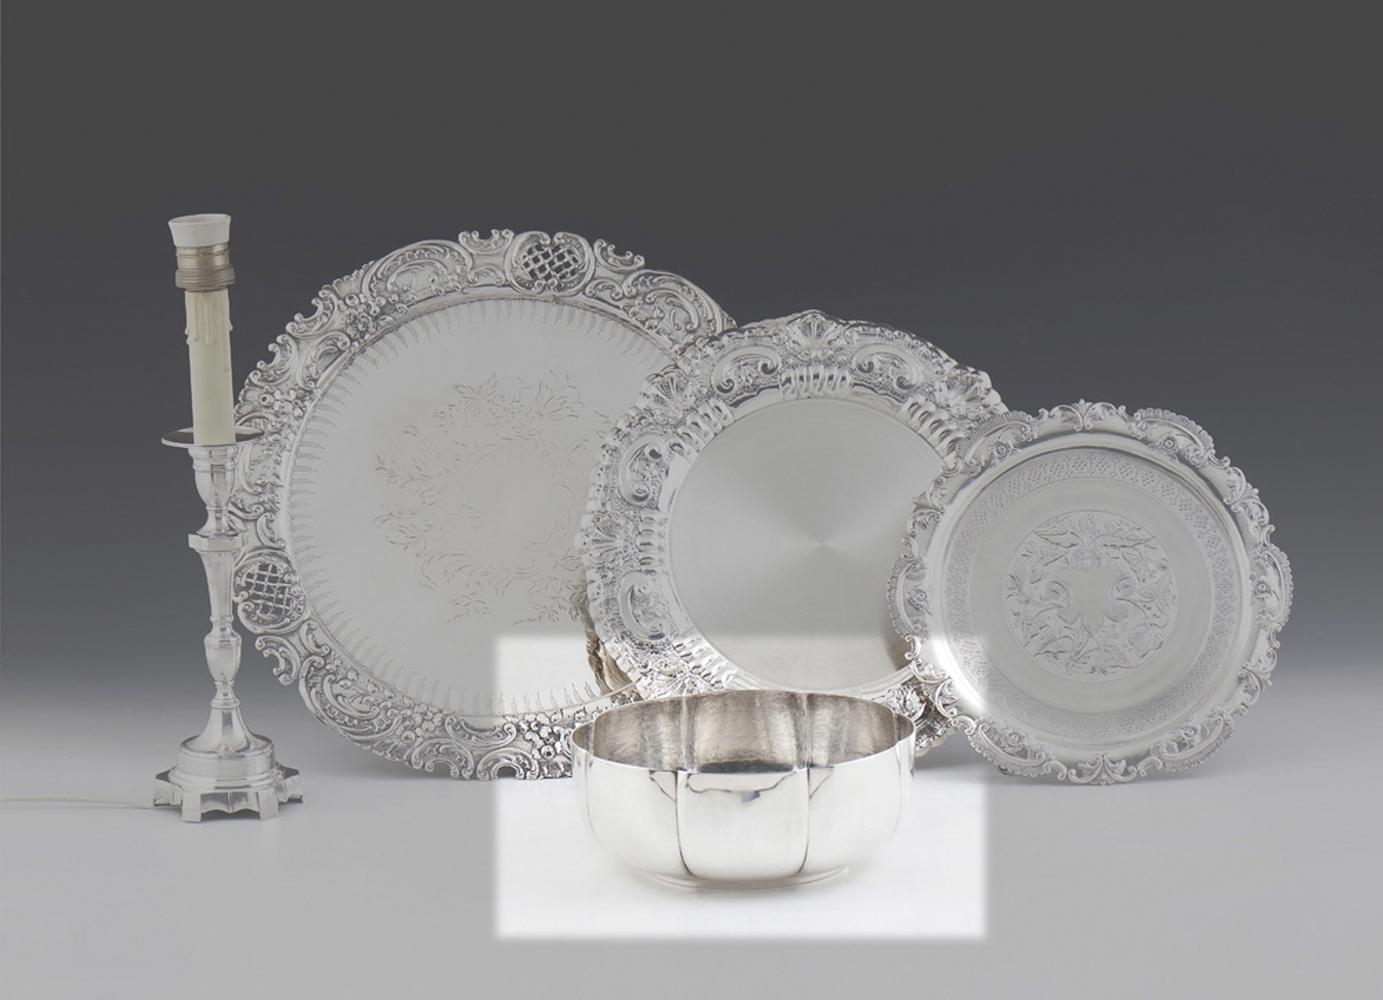 Taça em prata portuguesa, 833%, P: 698 g.